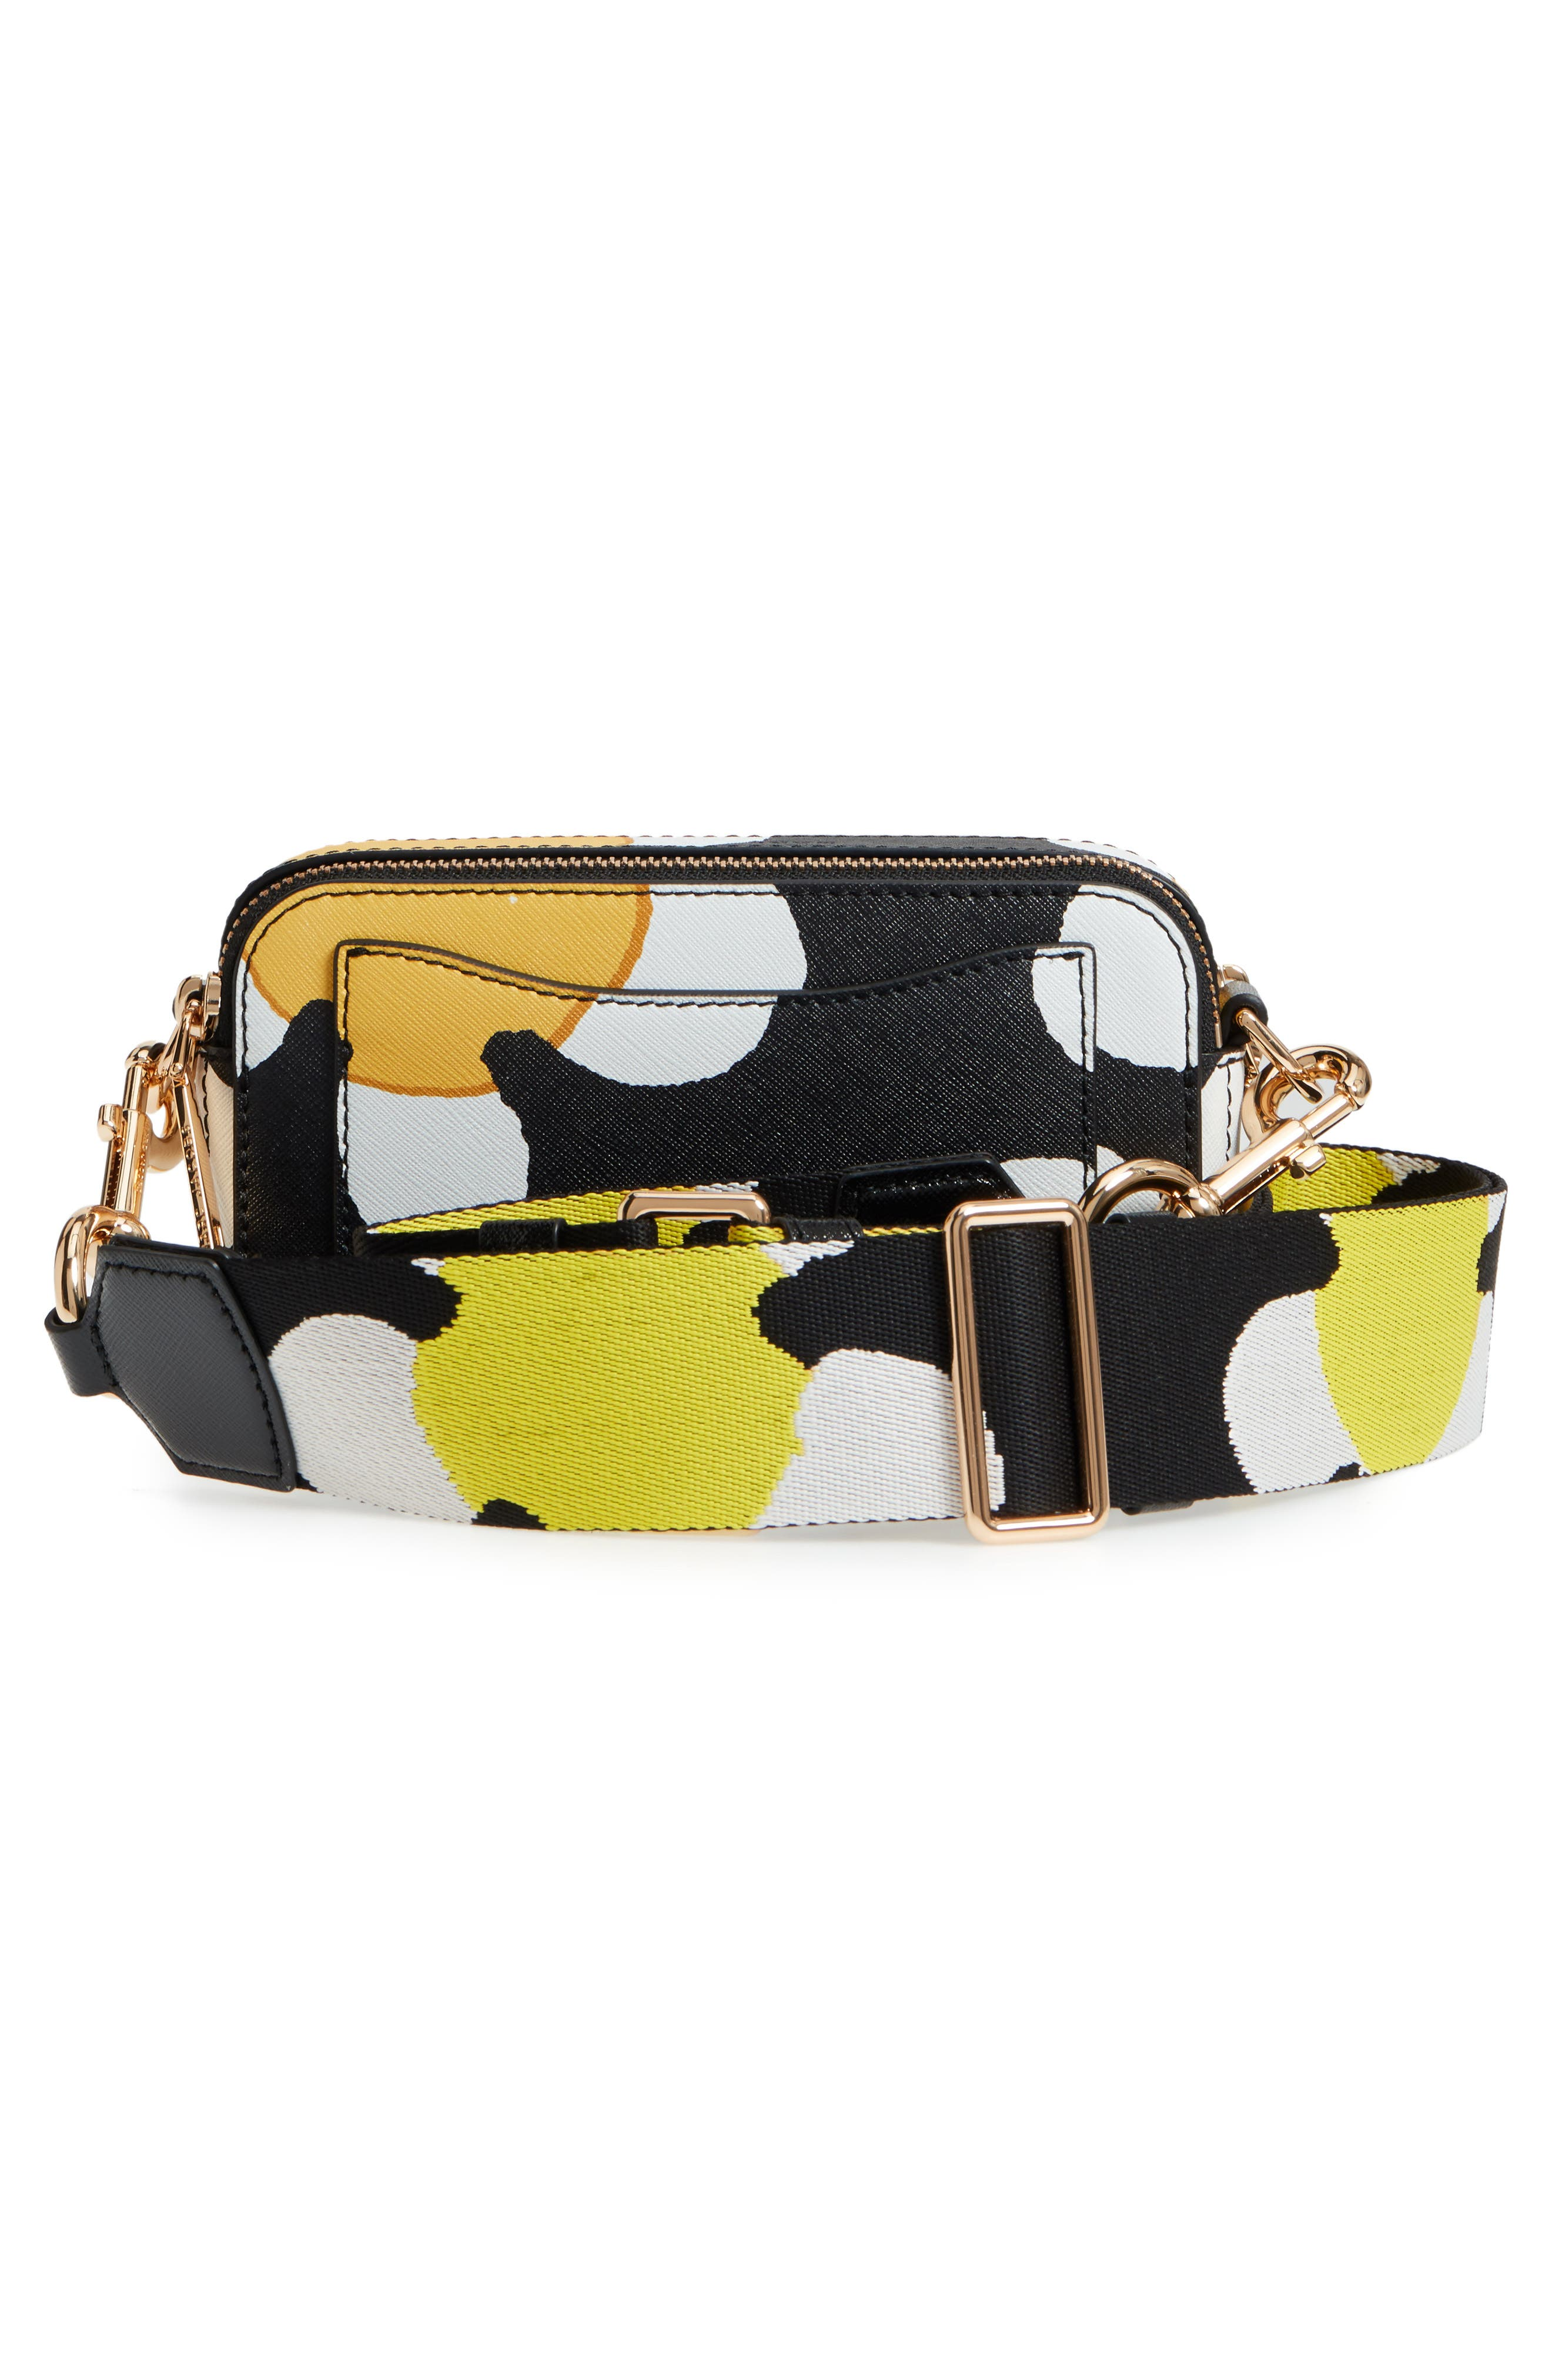 Snapshot Daisy Print Leather Crossbody Bag,                             Alternate thumbnail 3, color,                             750